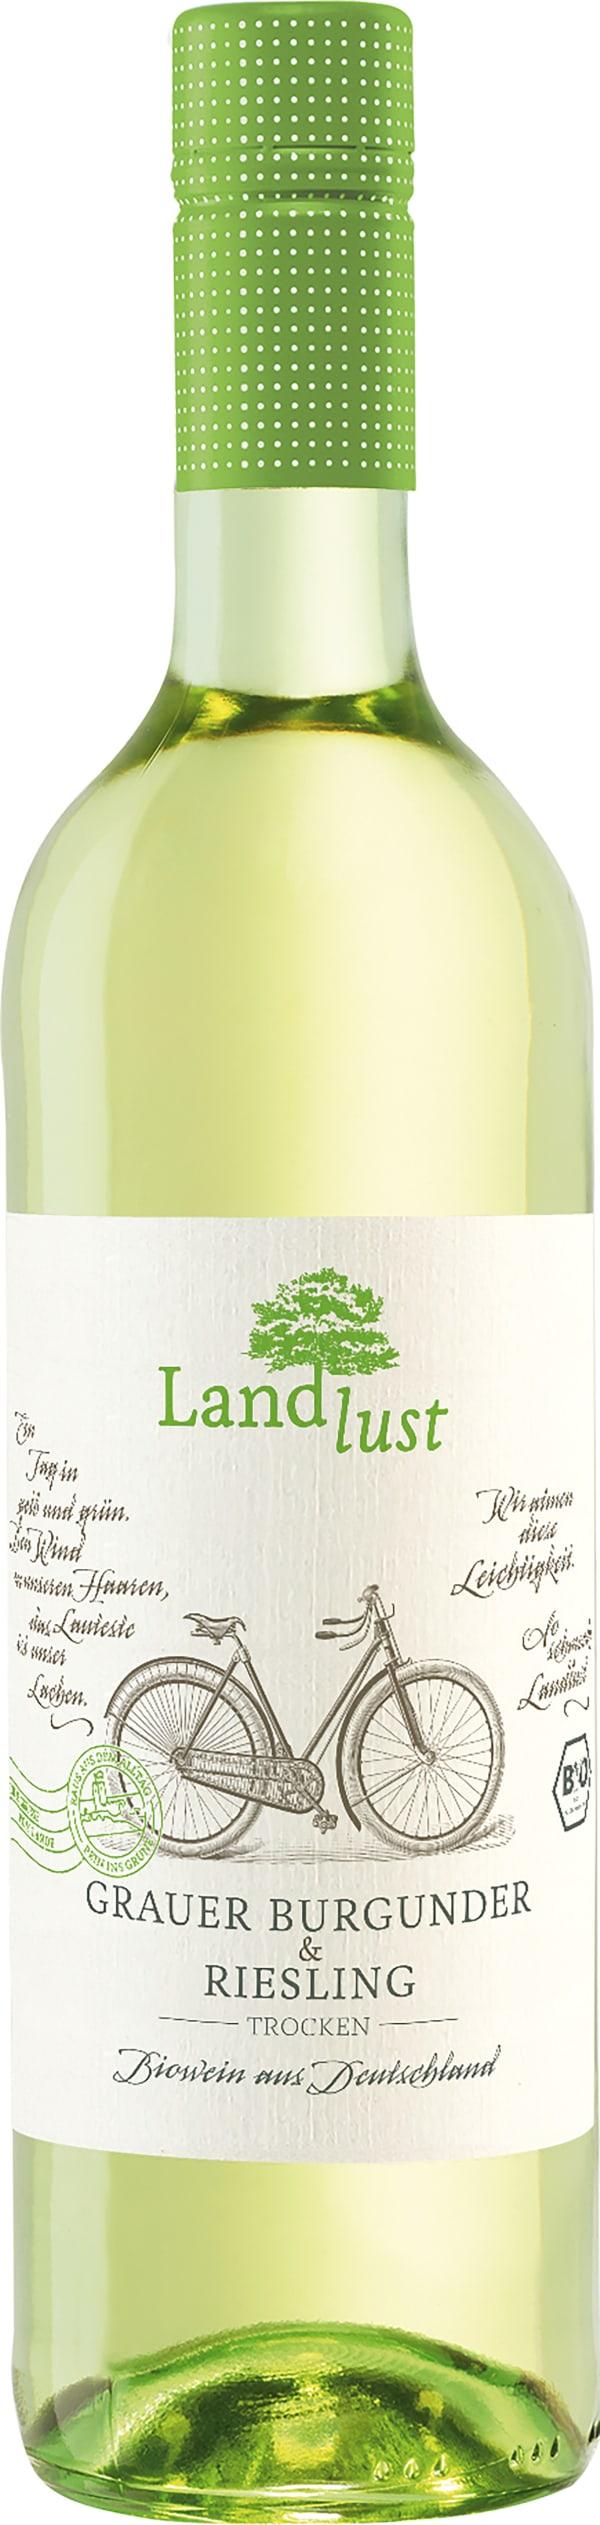 Landlust Bio Grauer Burgunder & Riesling Trocken 2019